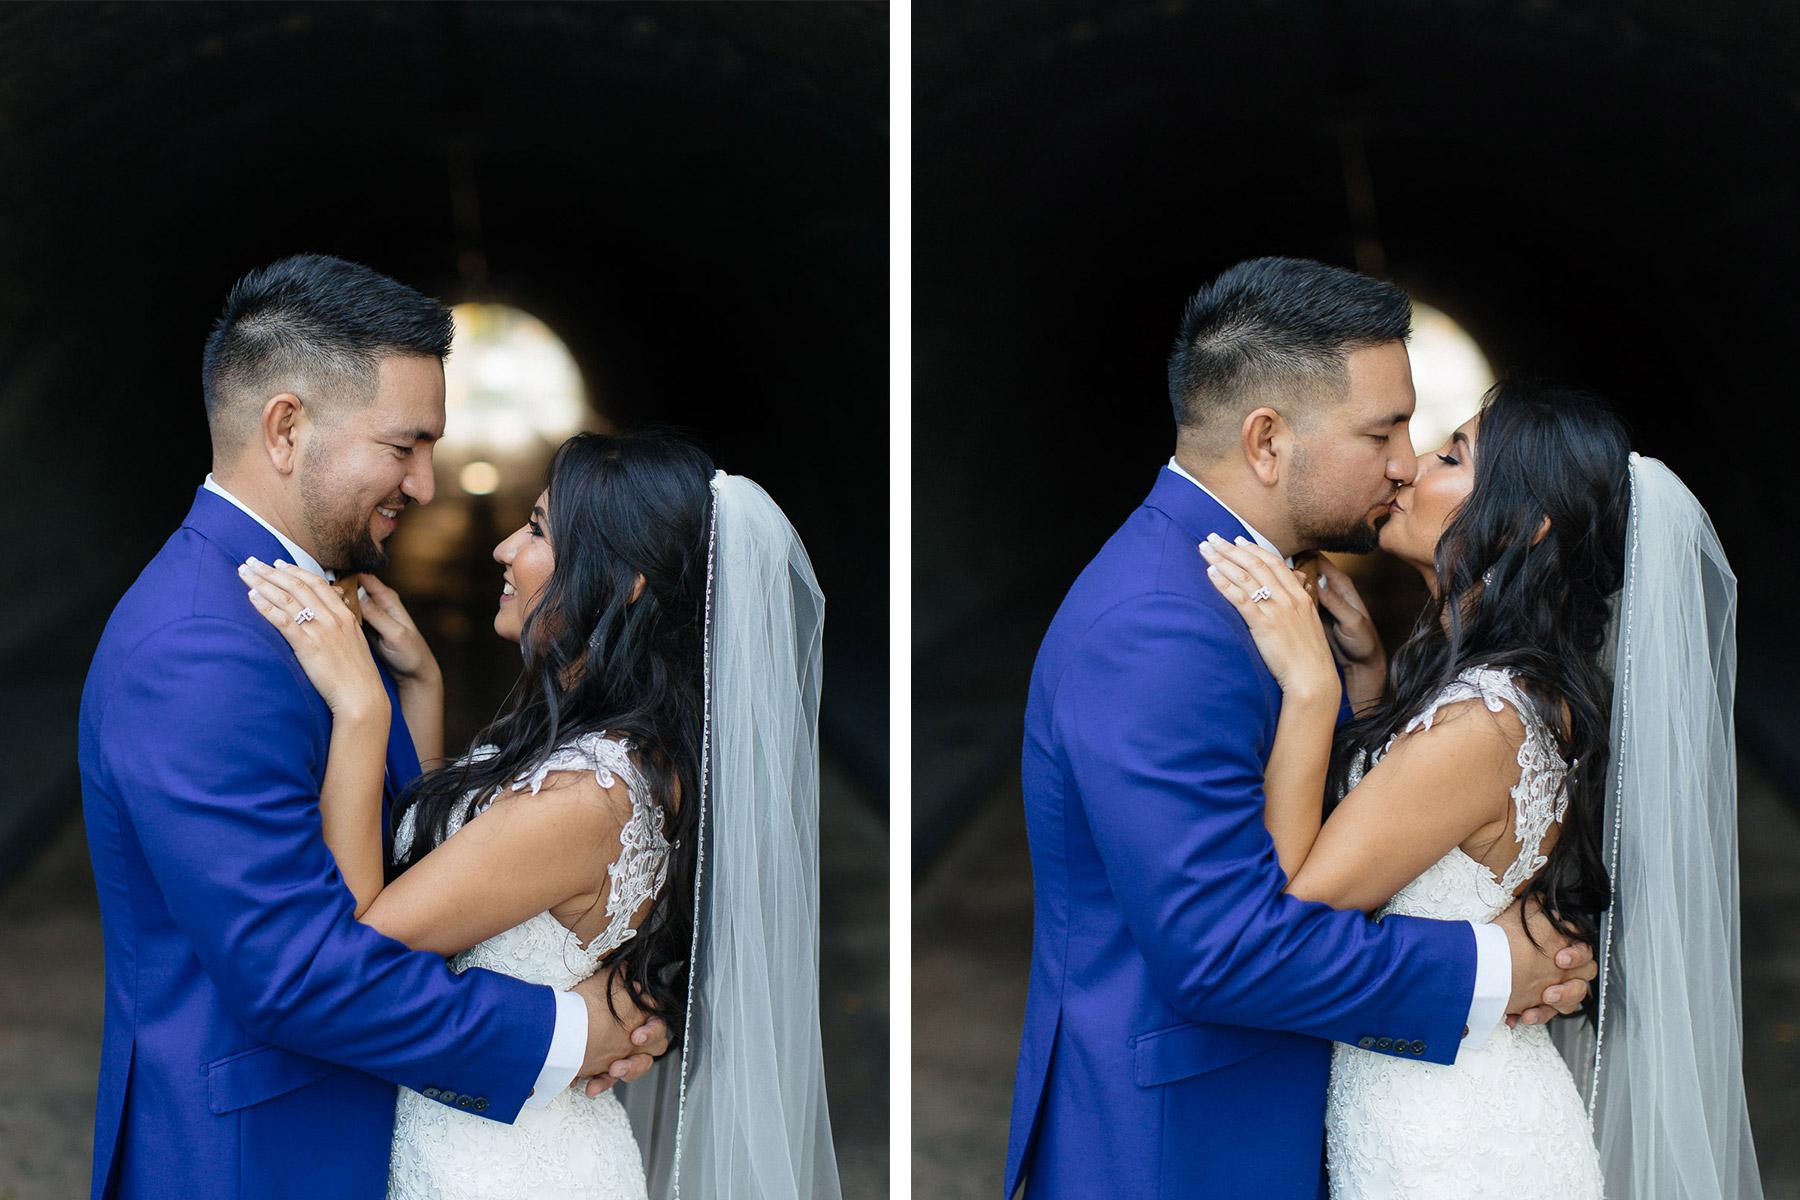 161029-Luxium-Weddings-Arizona-Jeff-Griselda-First-Look-Val-Vista-Lakes-Gilber-066a.jpg